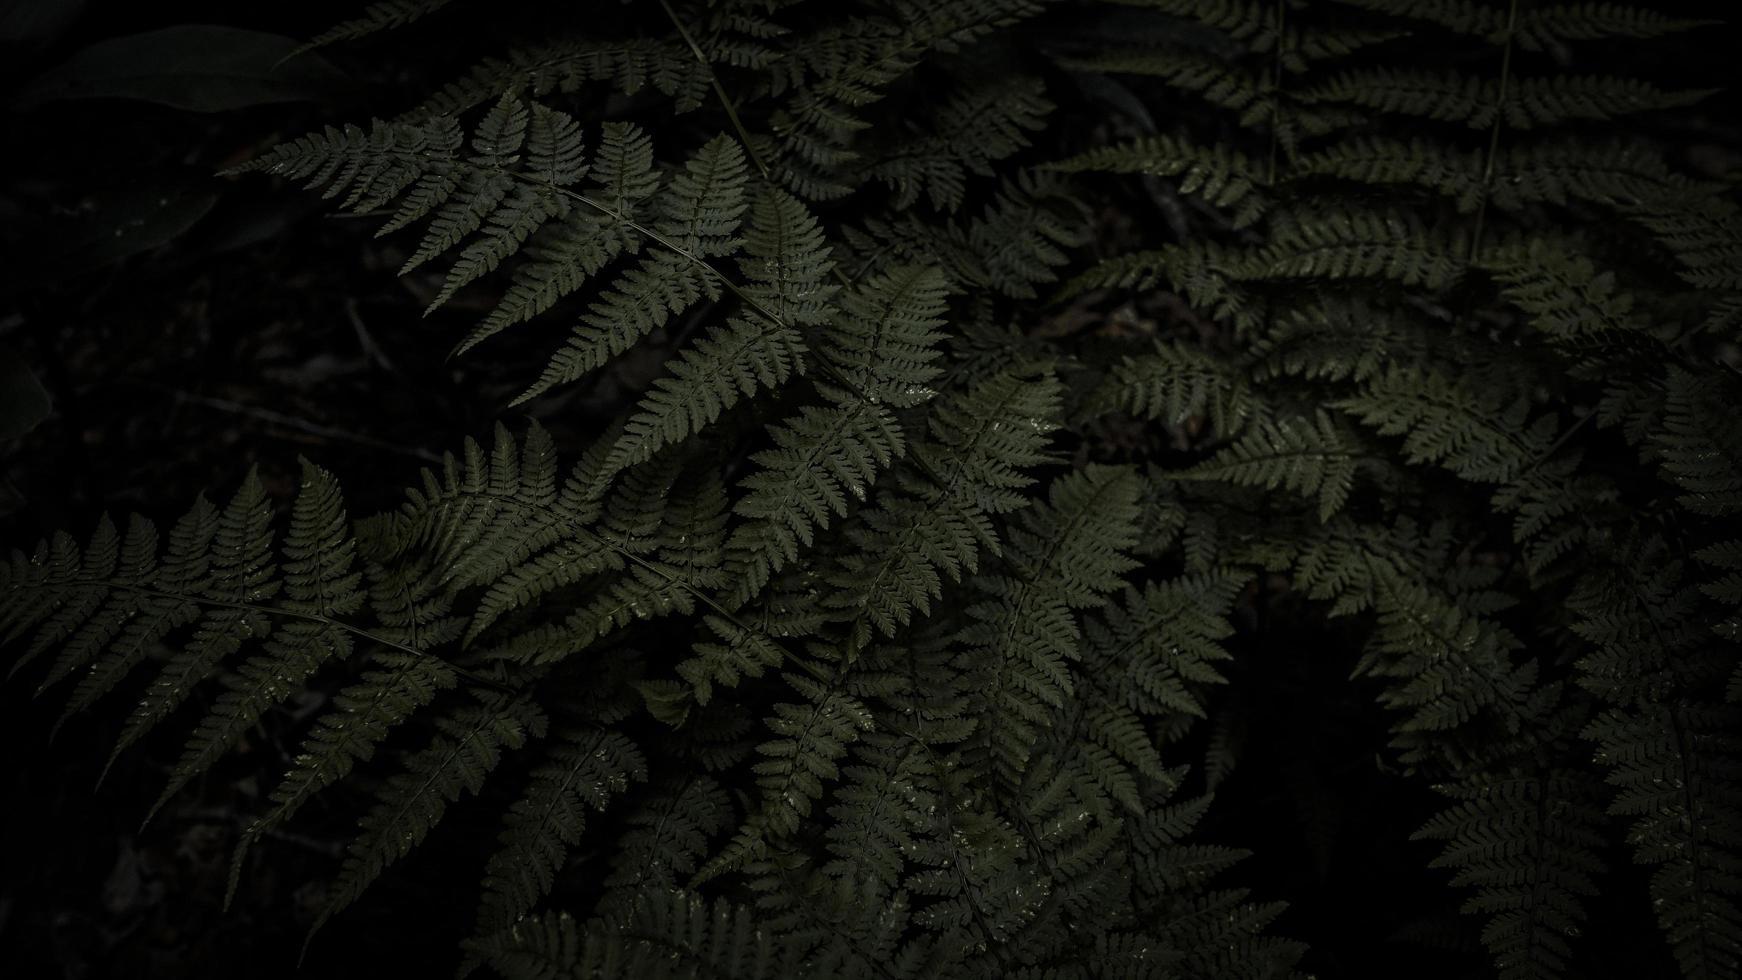 Green fern plant photo